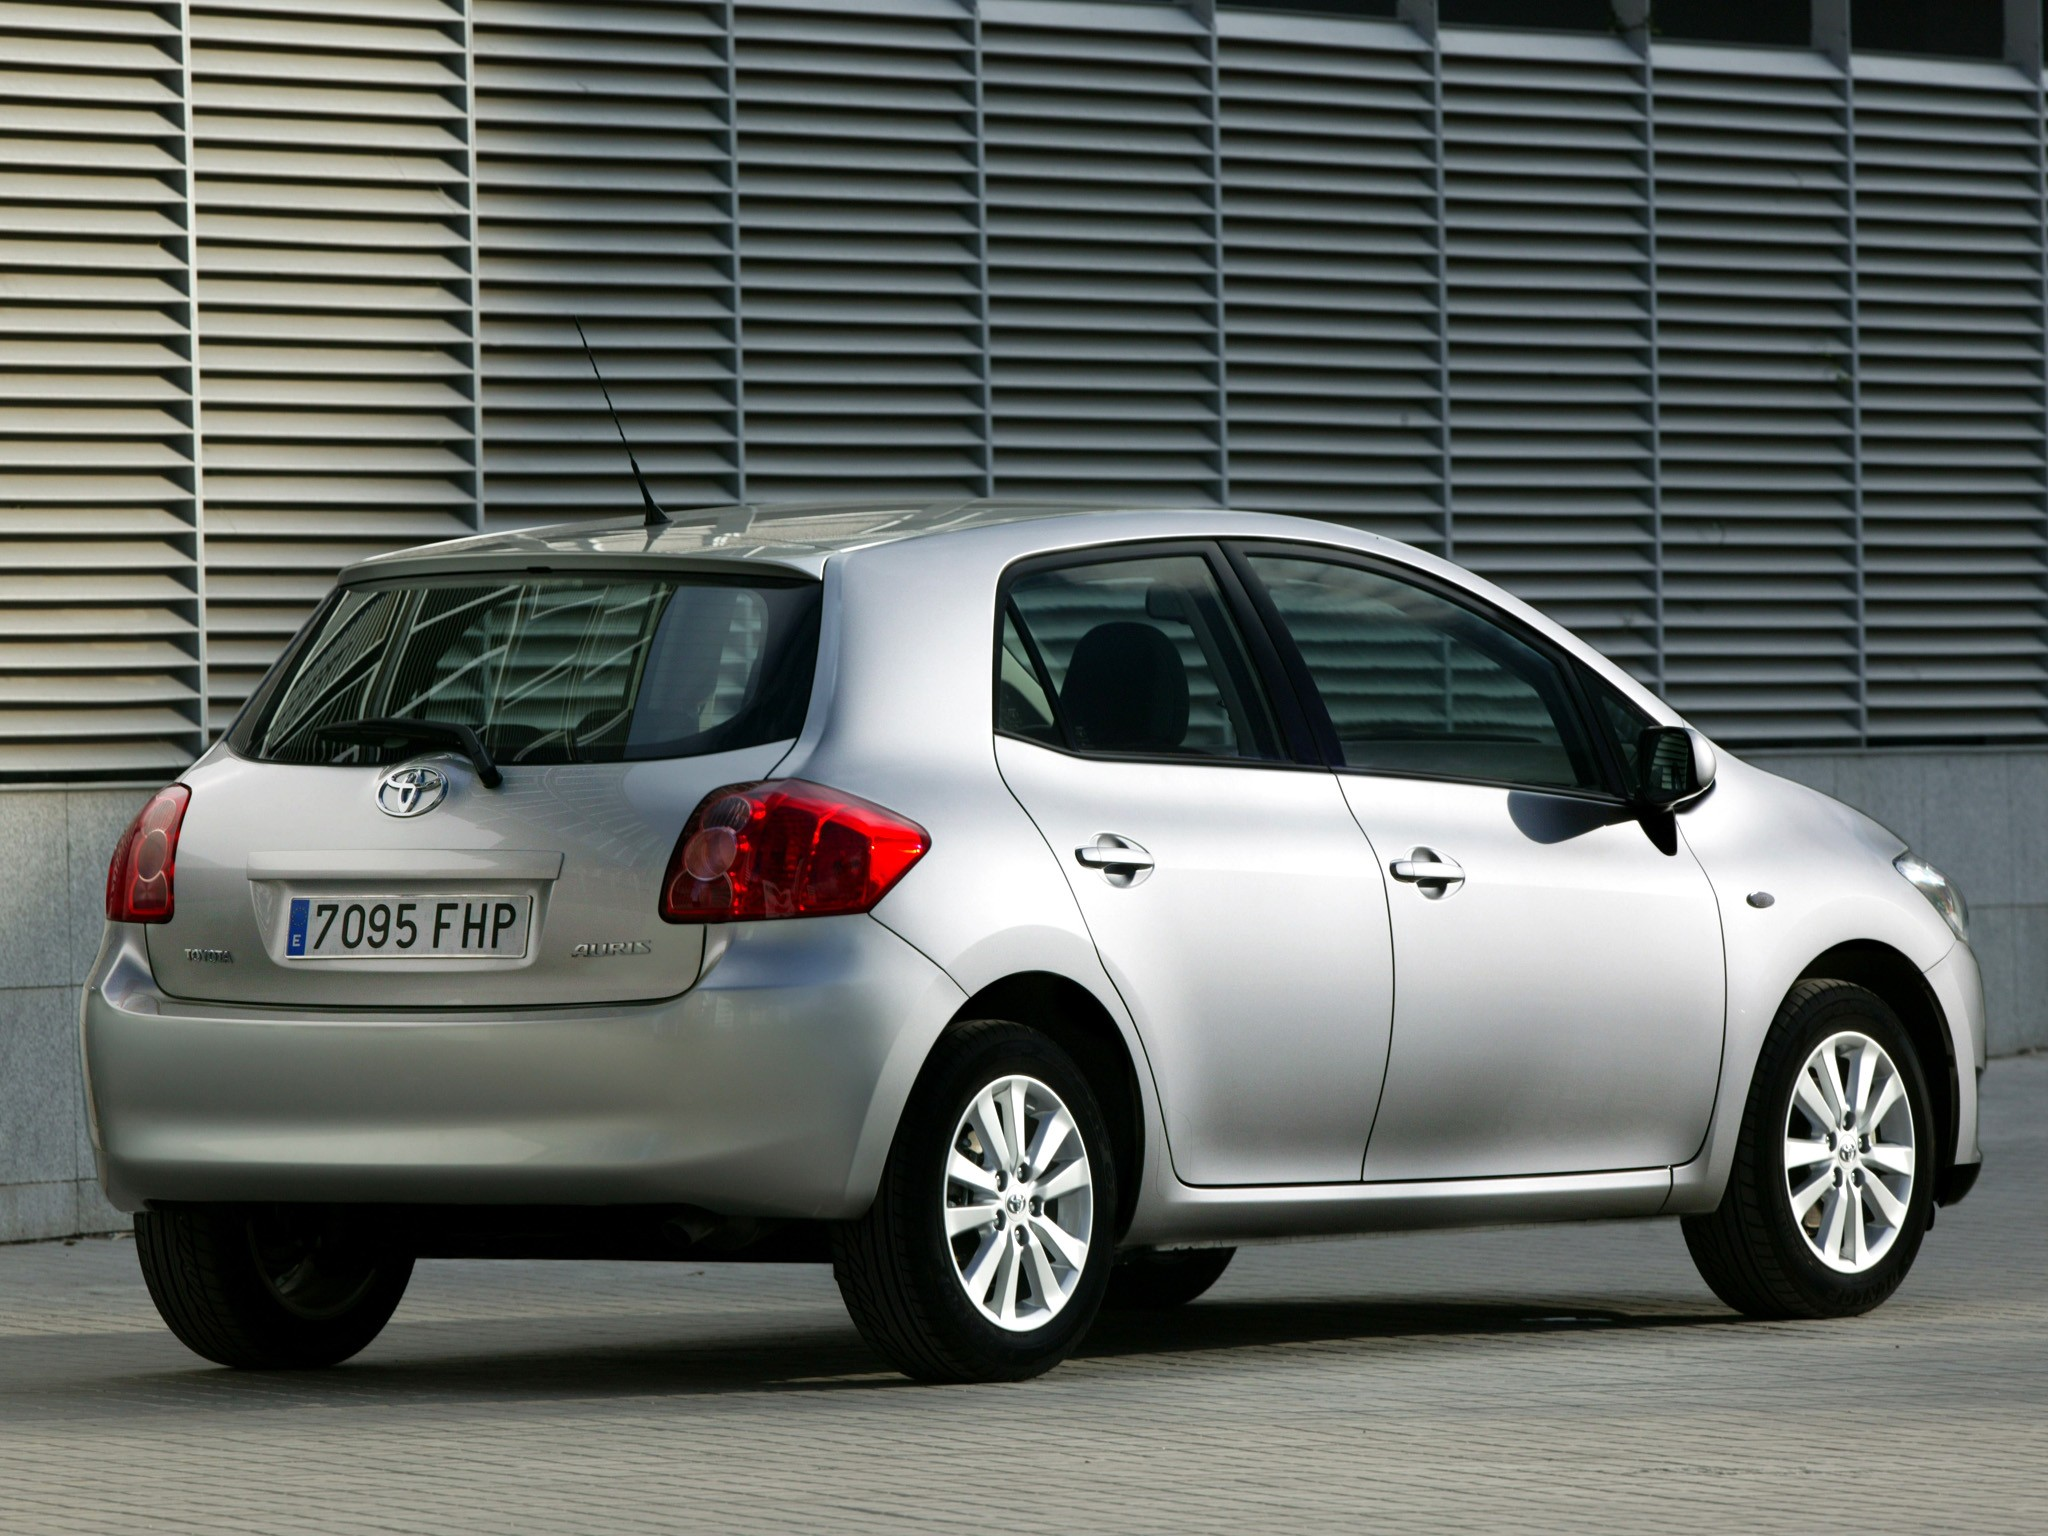 Toyota Auris Diesel 2016 >> TOYOTA Auris 5 Doors specs & photos - 2006, 2007, 2008, 2009, 2010 - autoevolution